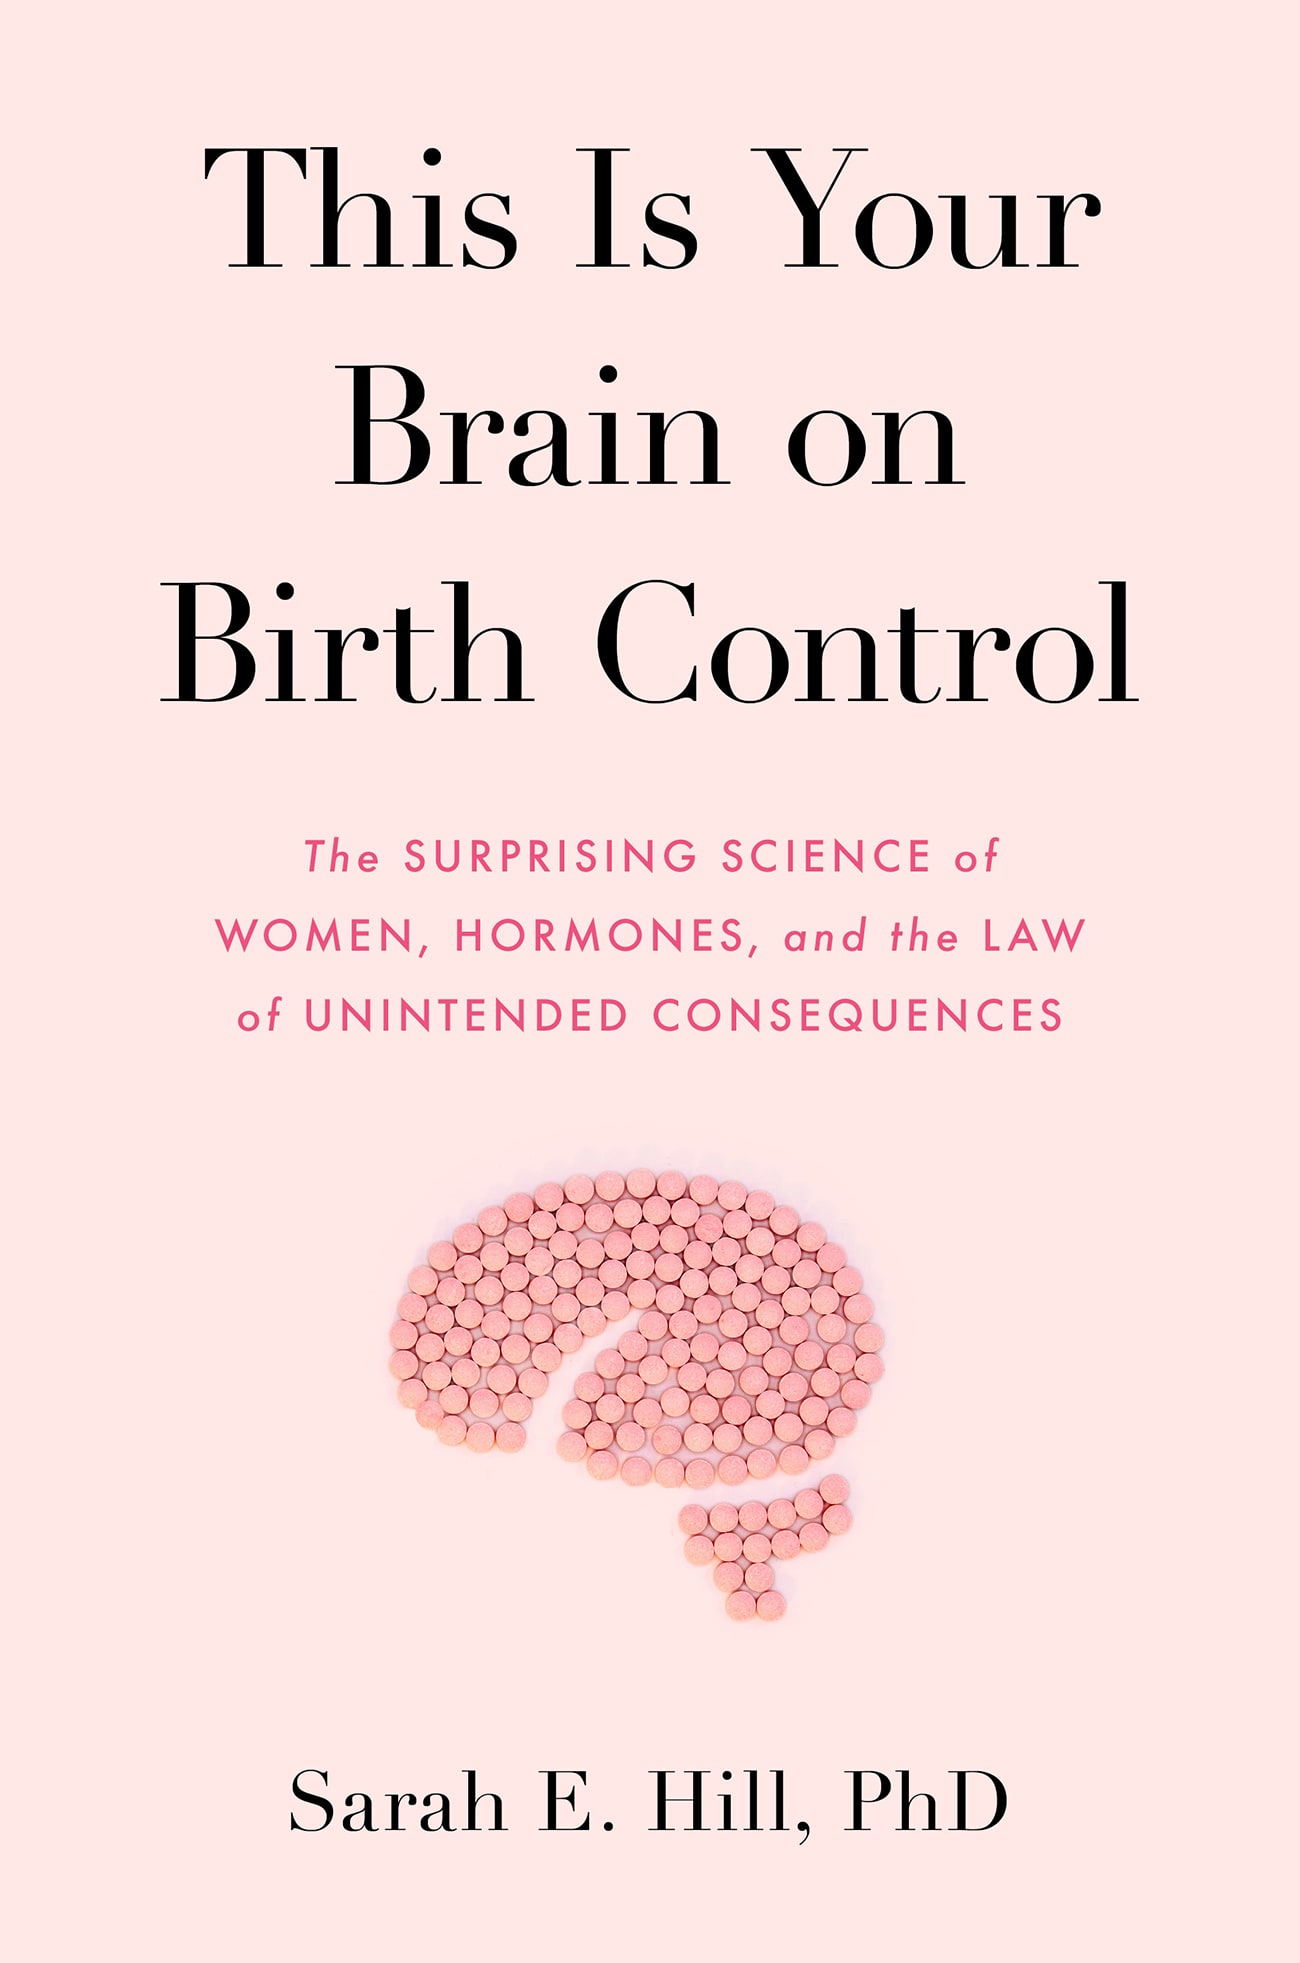 BrainBirthControl